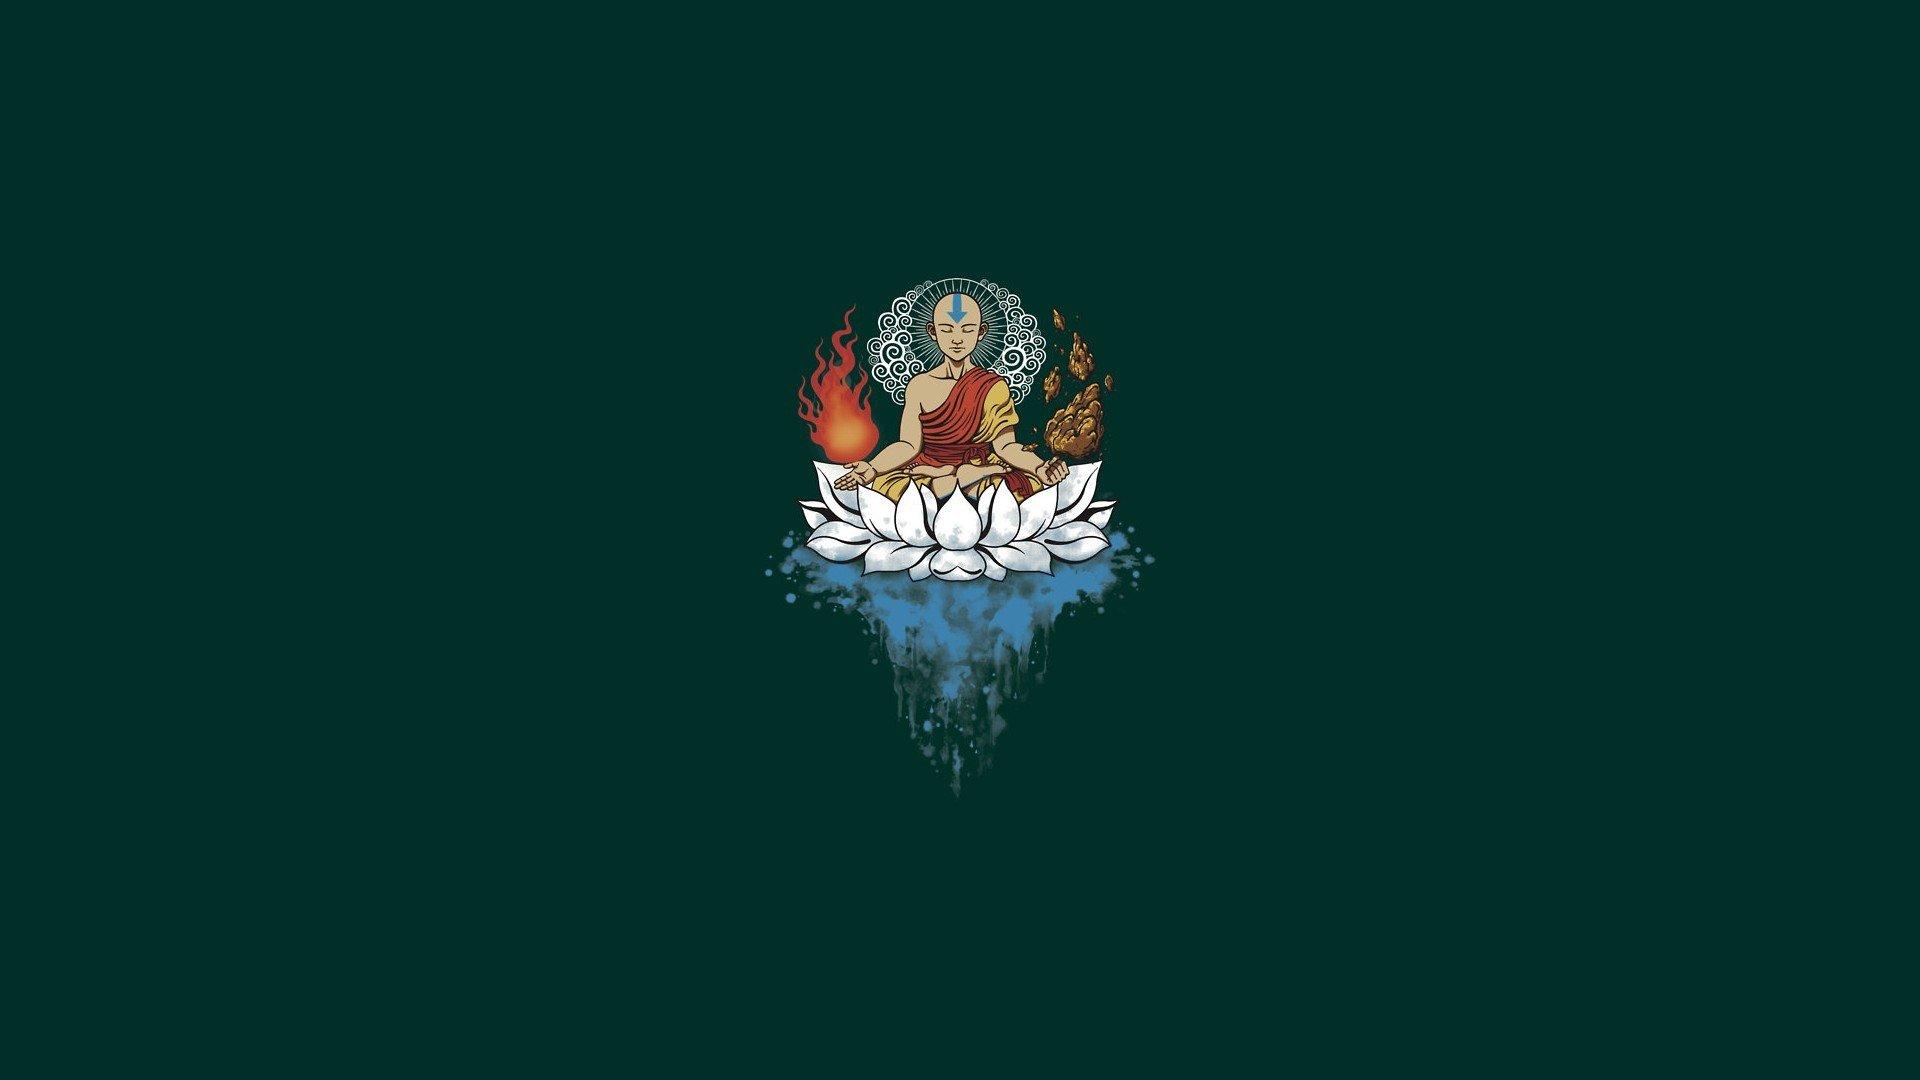 minimalism, Buddhism, Avatar: The Last Airbender, Aang, Elements, Meditation Wallpaper